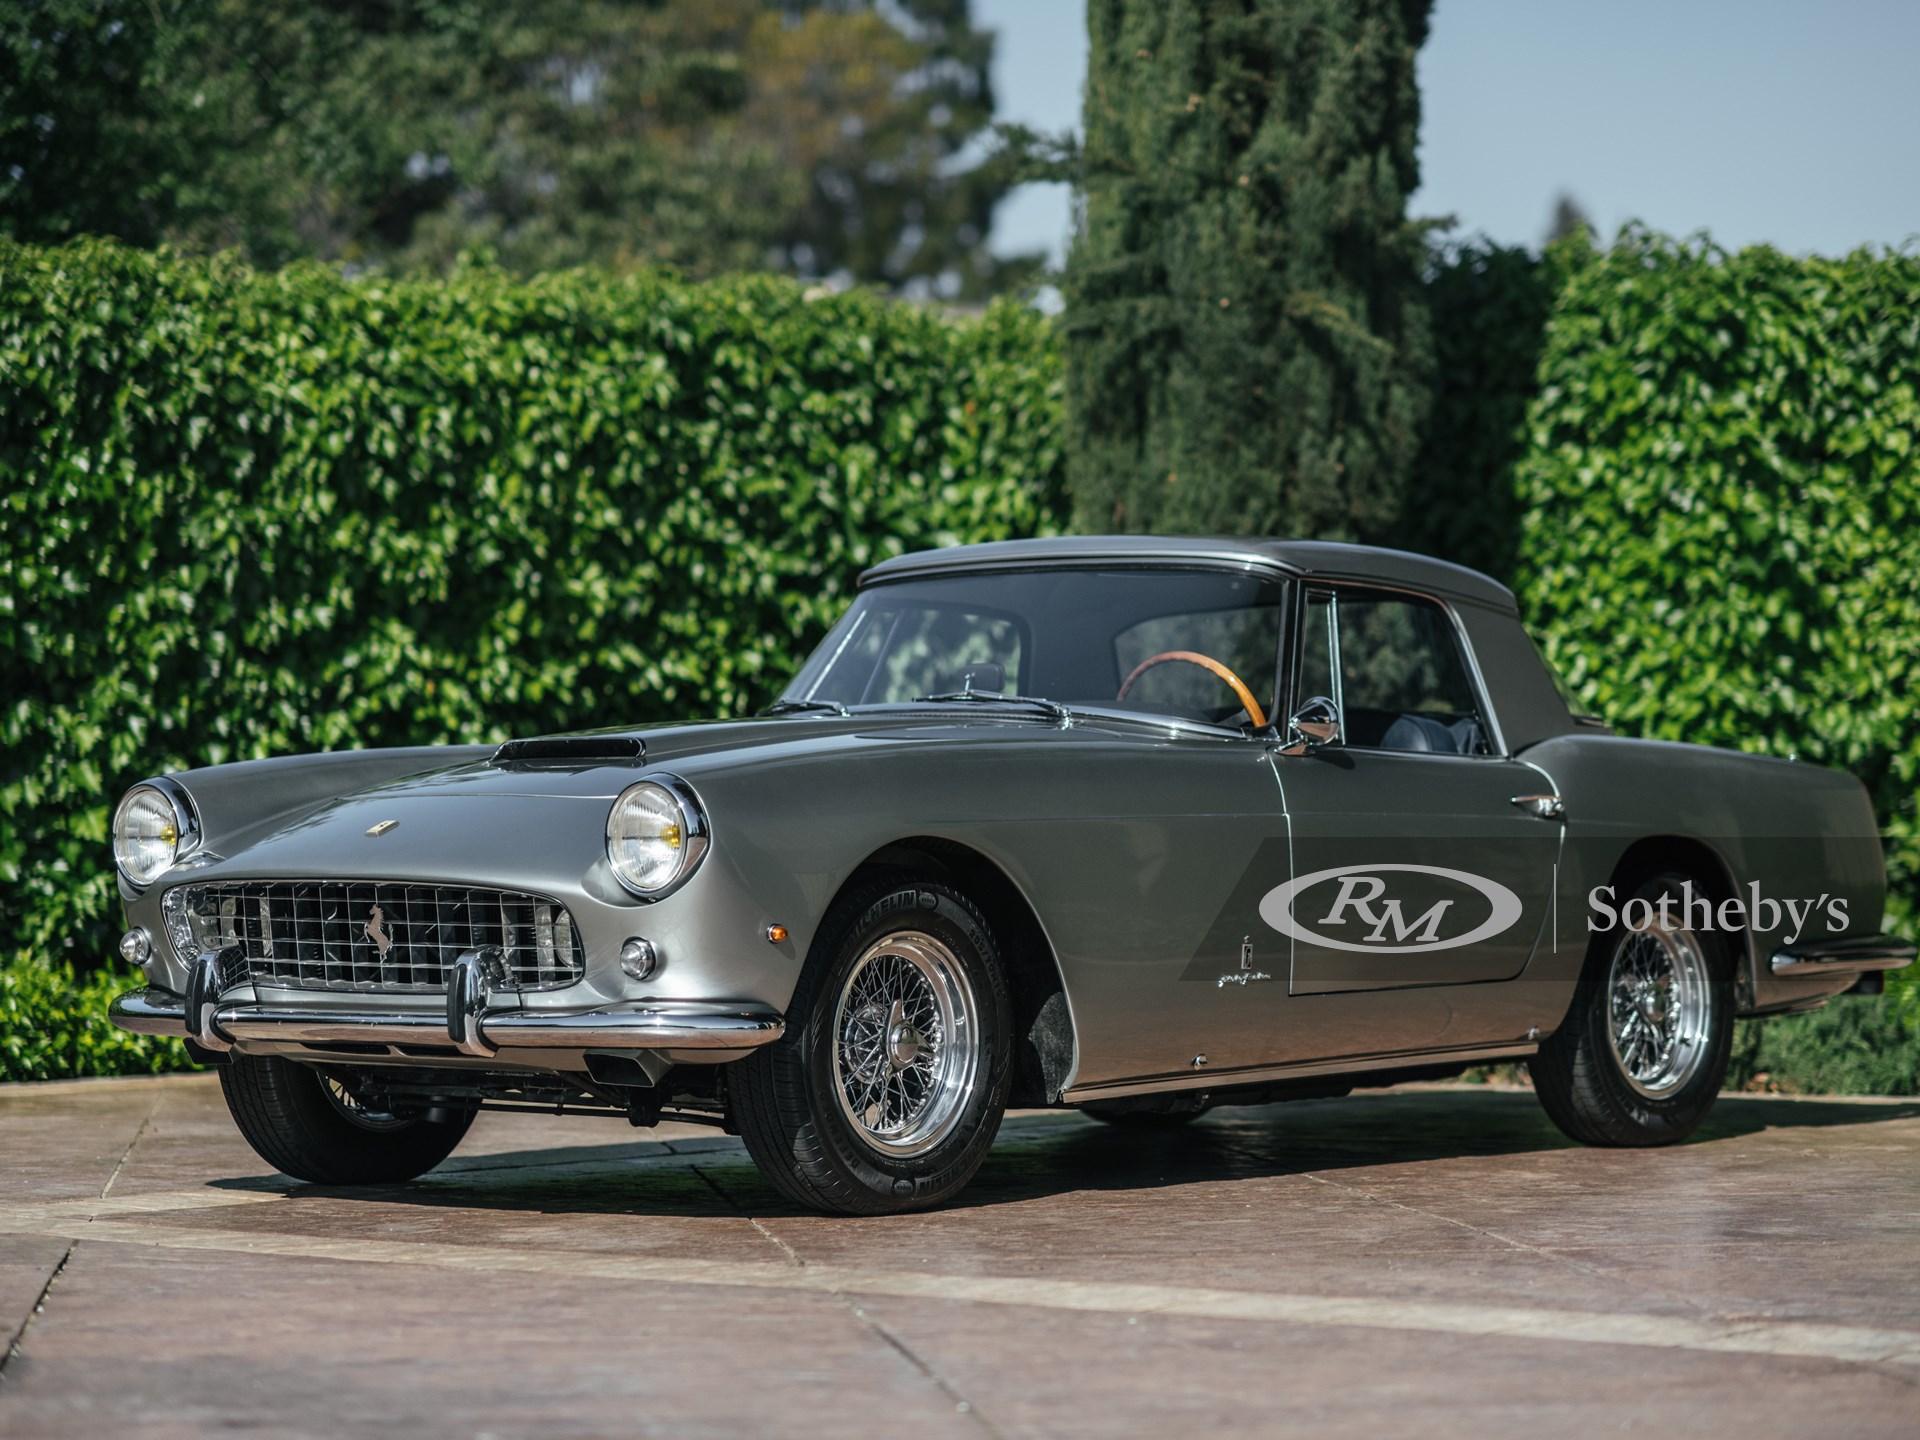 210427 RM Sotheby's Amelia Island Auction - 1961 Ferrari 250 GT Cabriolet Series II